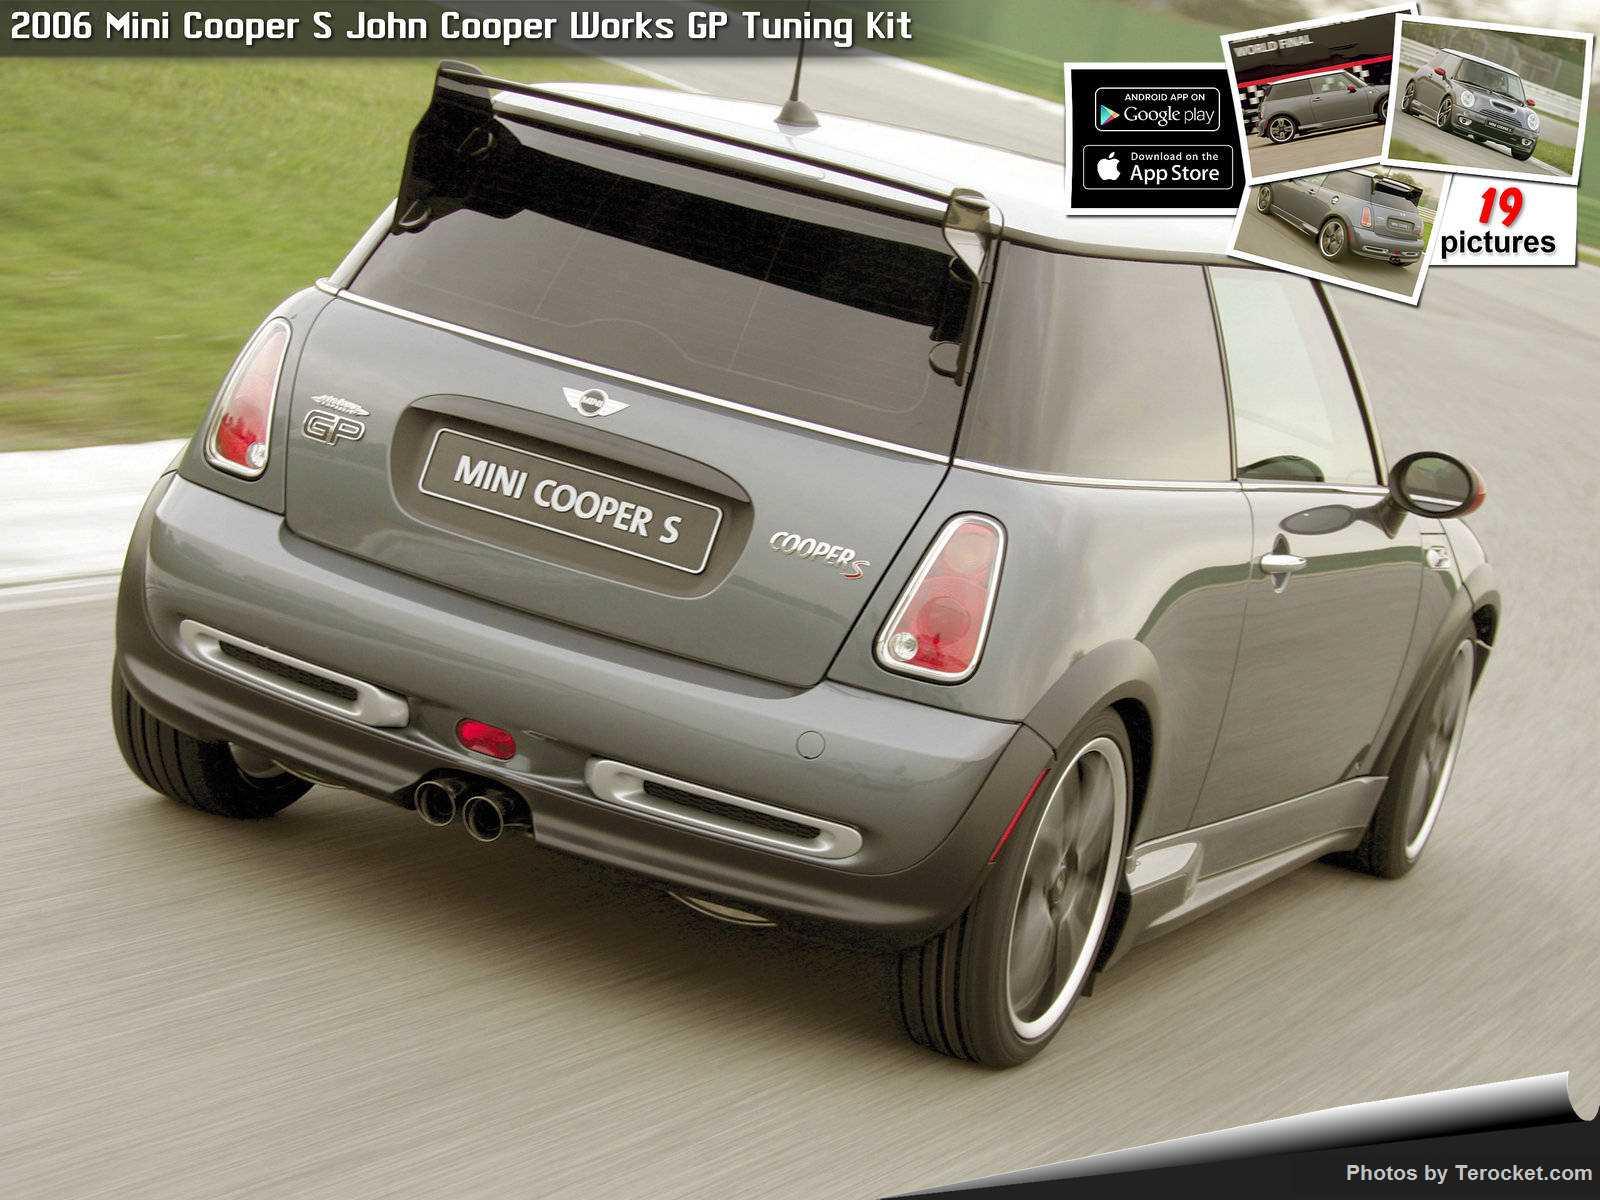 Hình ảnh xe ô tô Mini Cooper S John Cooper Works GP Tuning Kit 2006 & nội ngoại thất